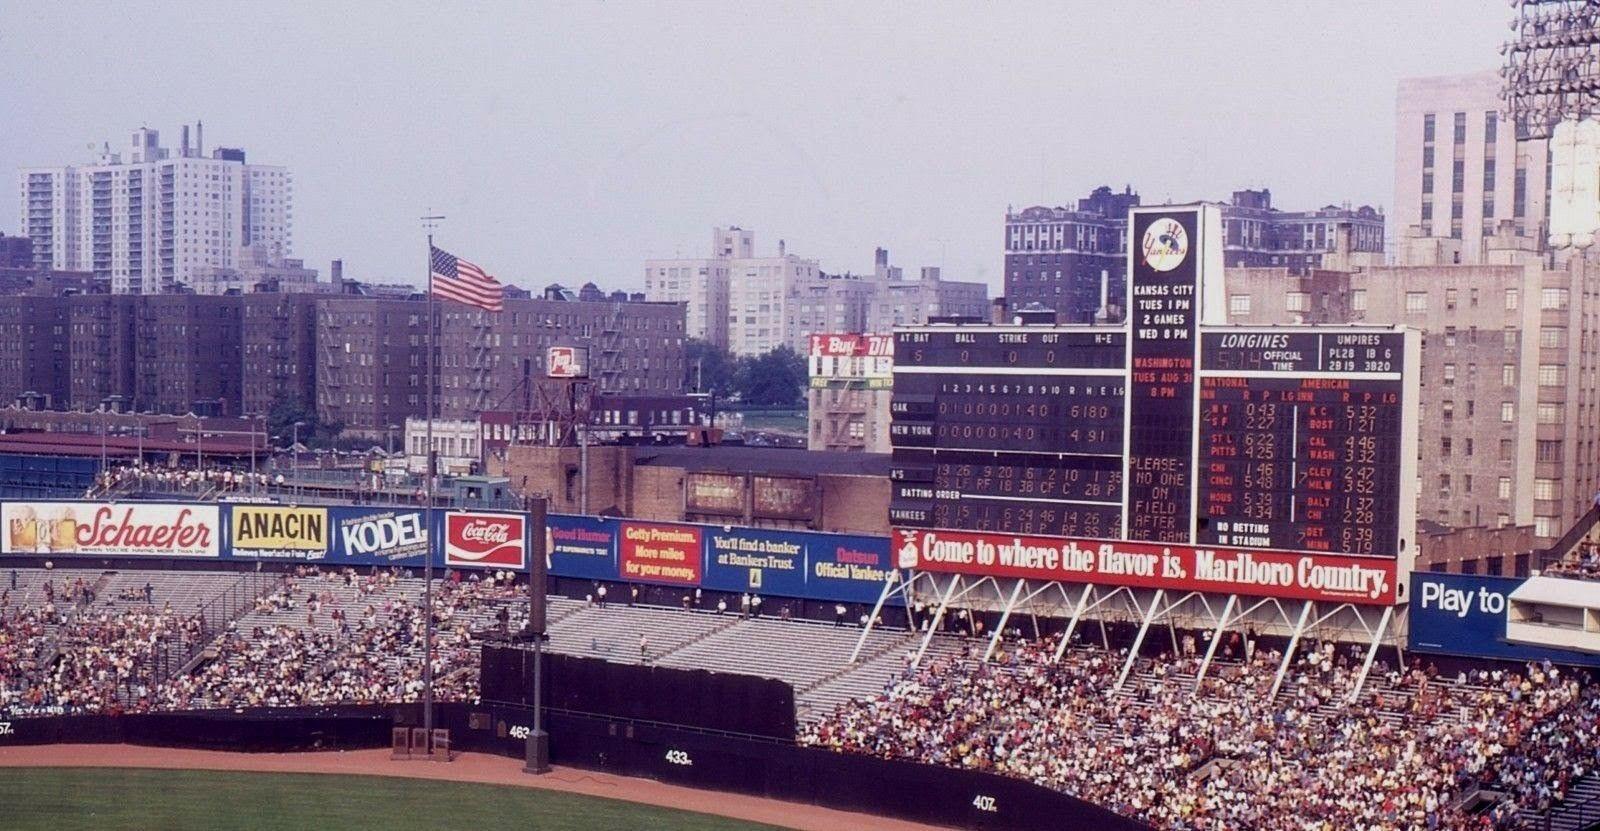 Pre Renovations Original Yankee St Dm Bronx N Y City N Y During 1971 M L B Season Date Game That Above Photo Was Marlboro Country Season Dates Marlboro